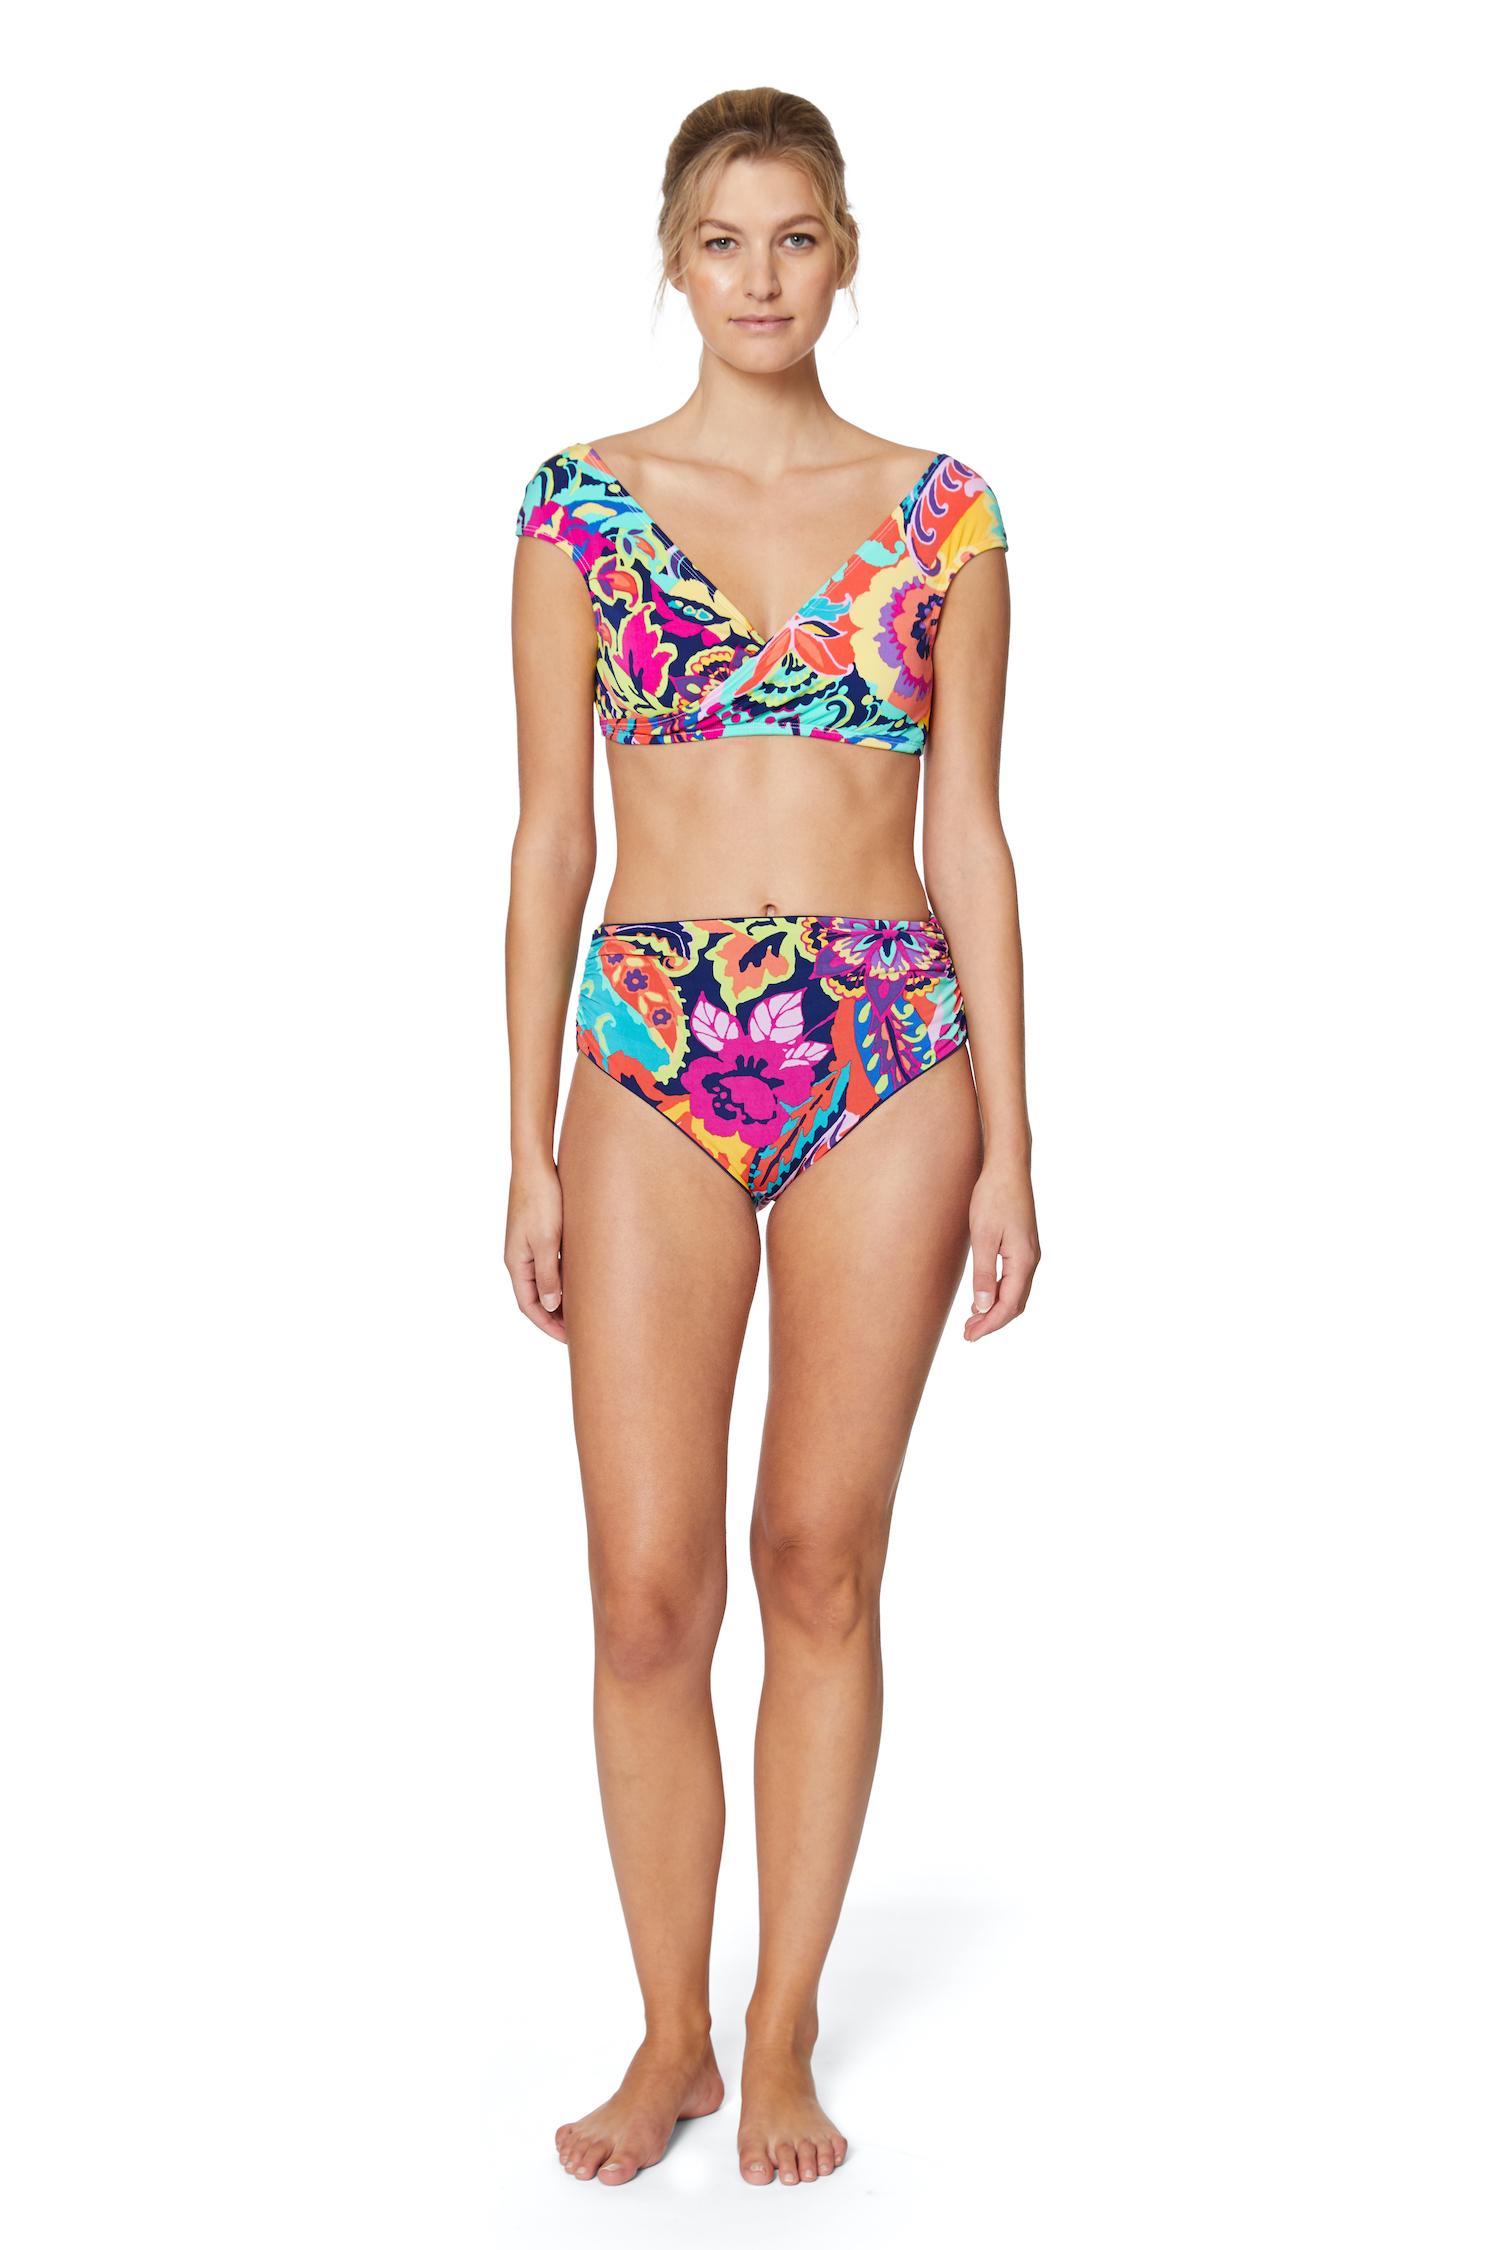 PRE ORDER Tahari® Paris Floral Wrap Bra Swimsuit Top -Multi - Front